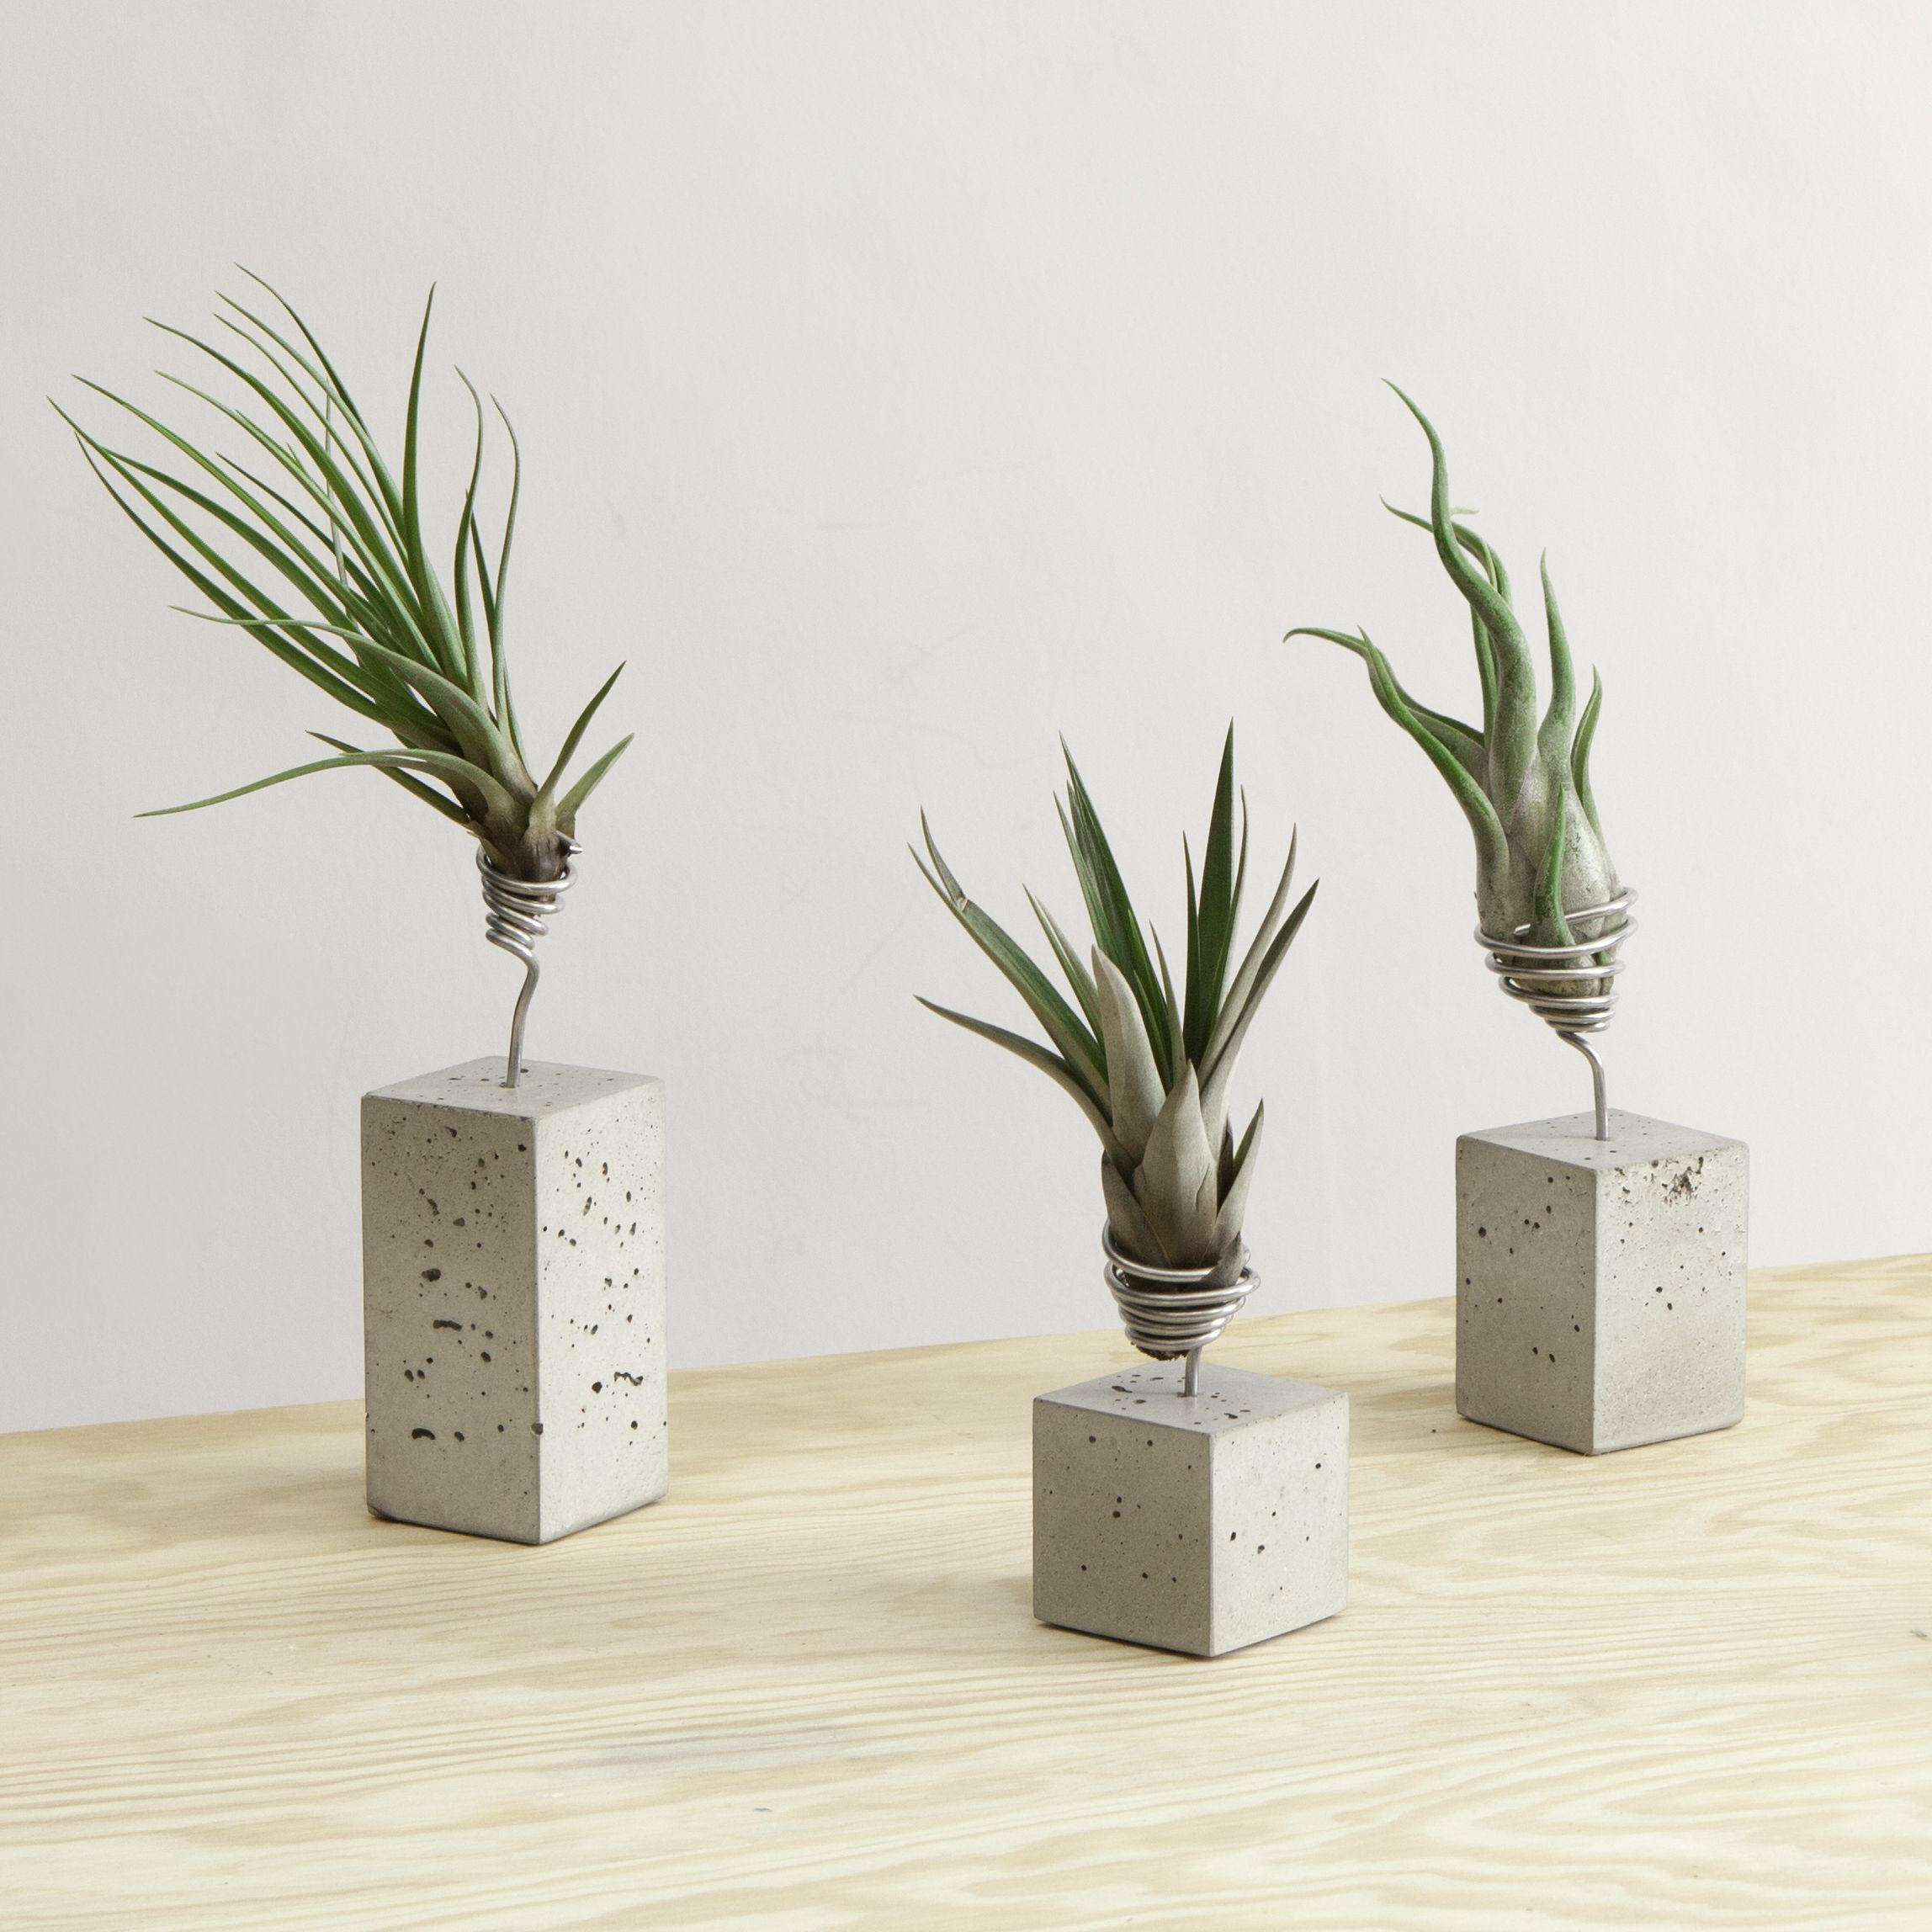 Plant Pot Holders Diy: DIY Inspiration - Concrete + Wire Air Plant Holders